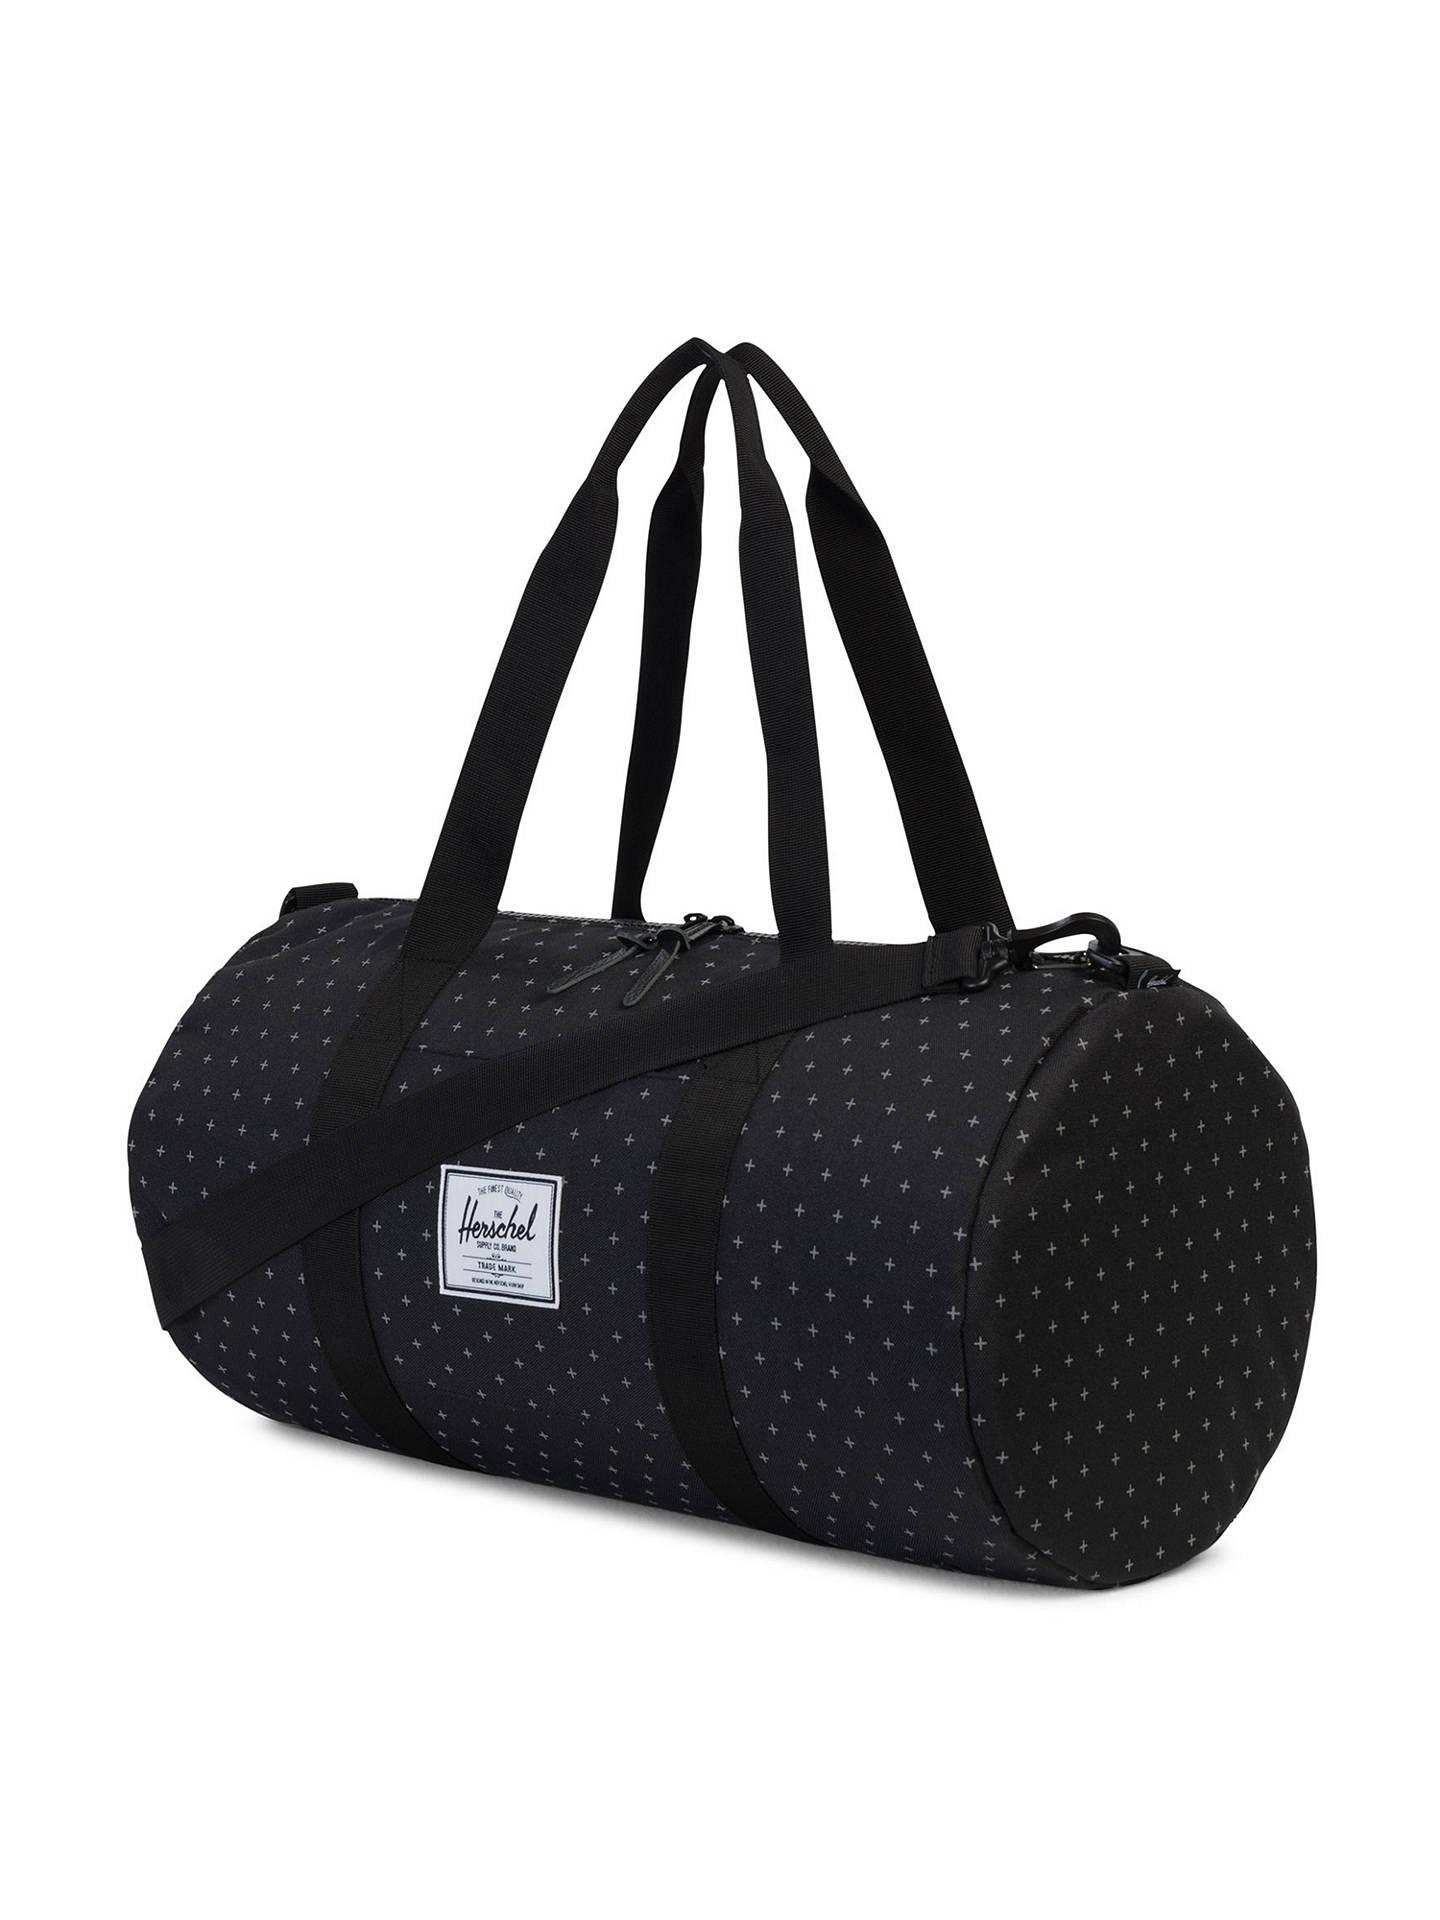 20a69188ad31 ... Buy Herschel Supply Co. Sutton Duffle Bag